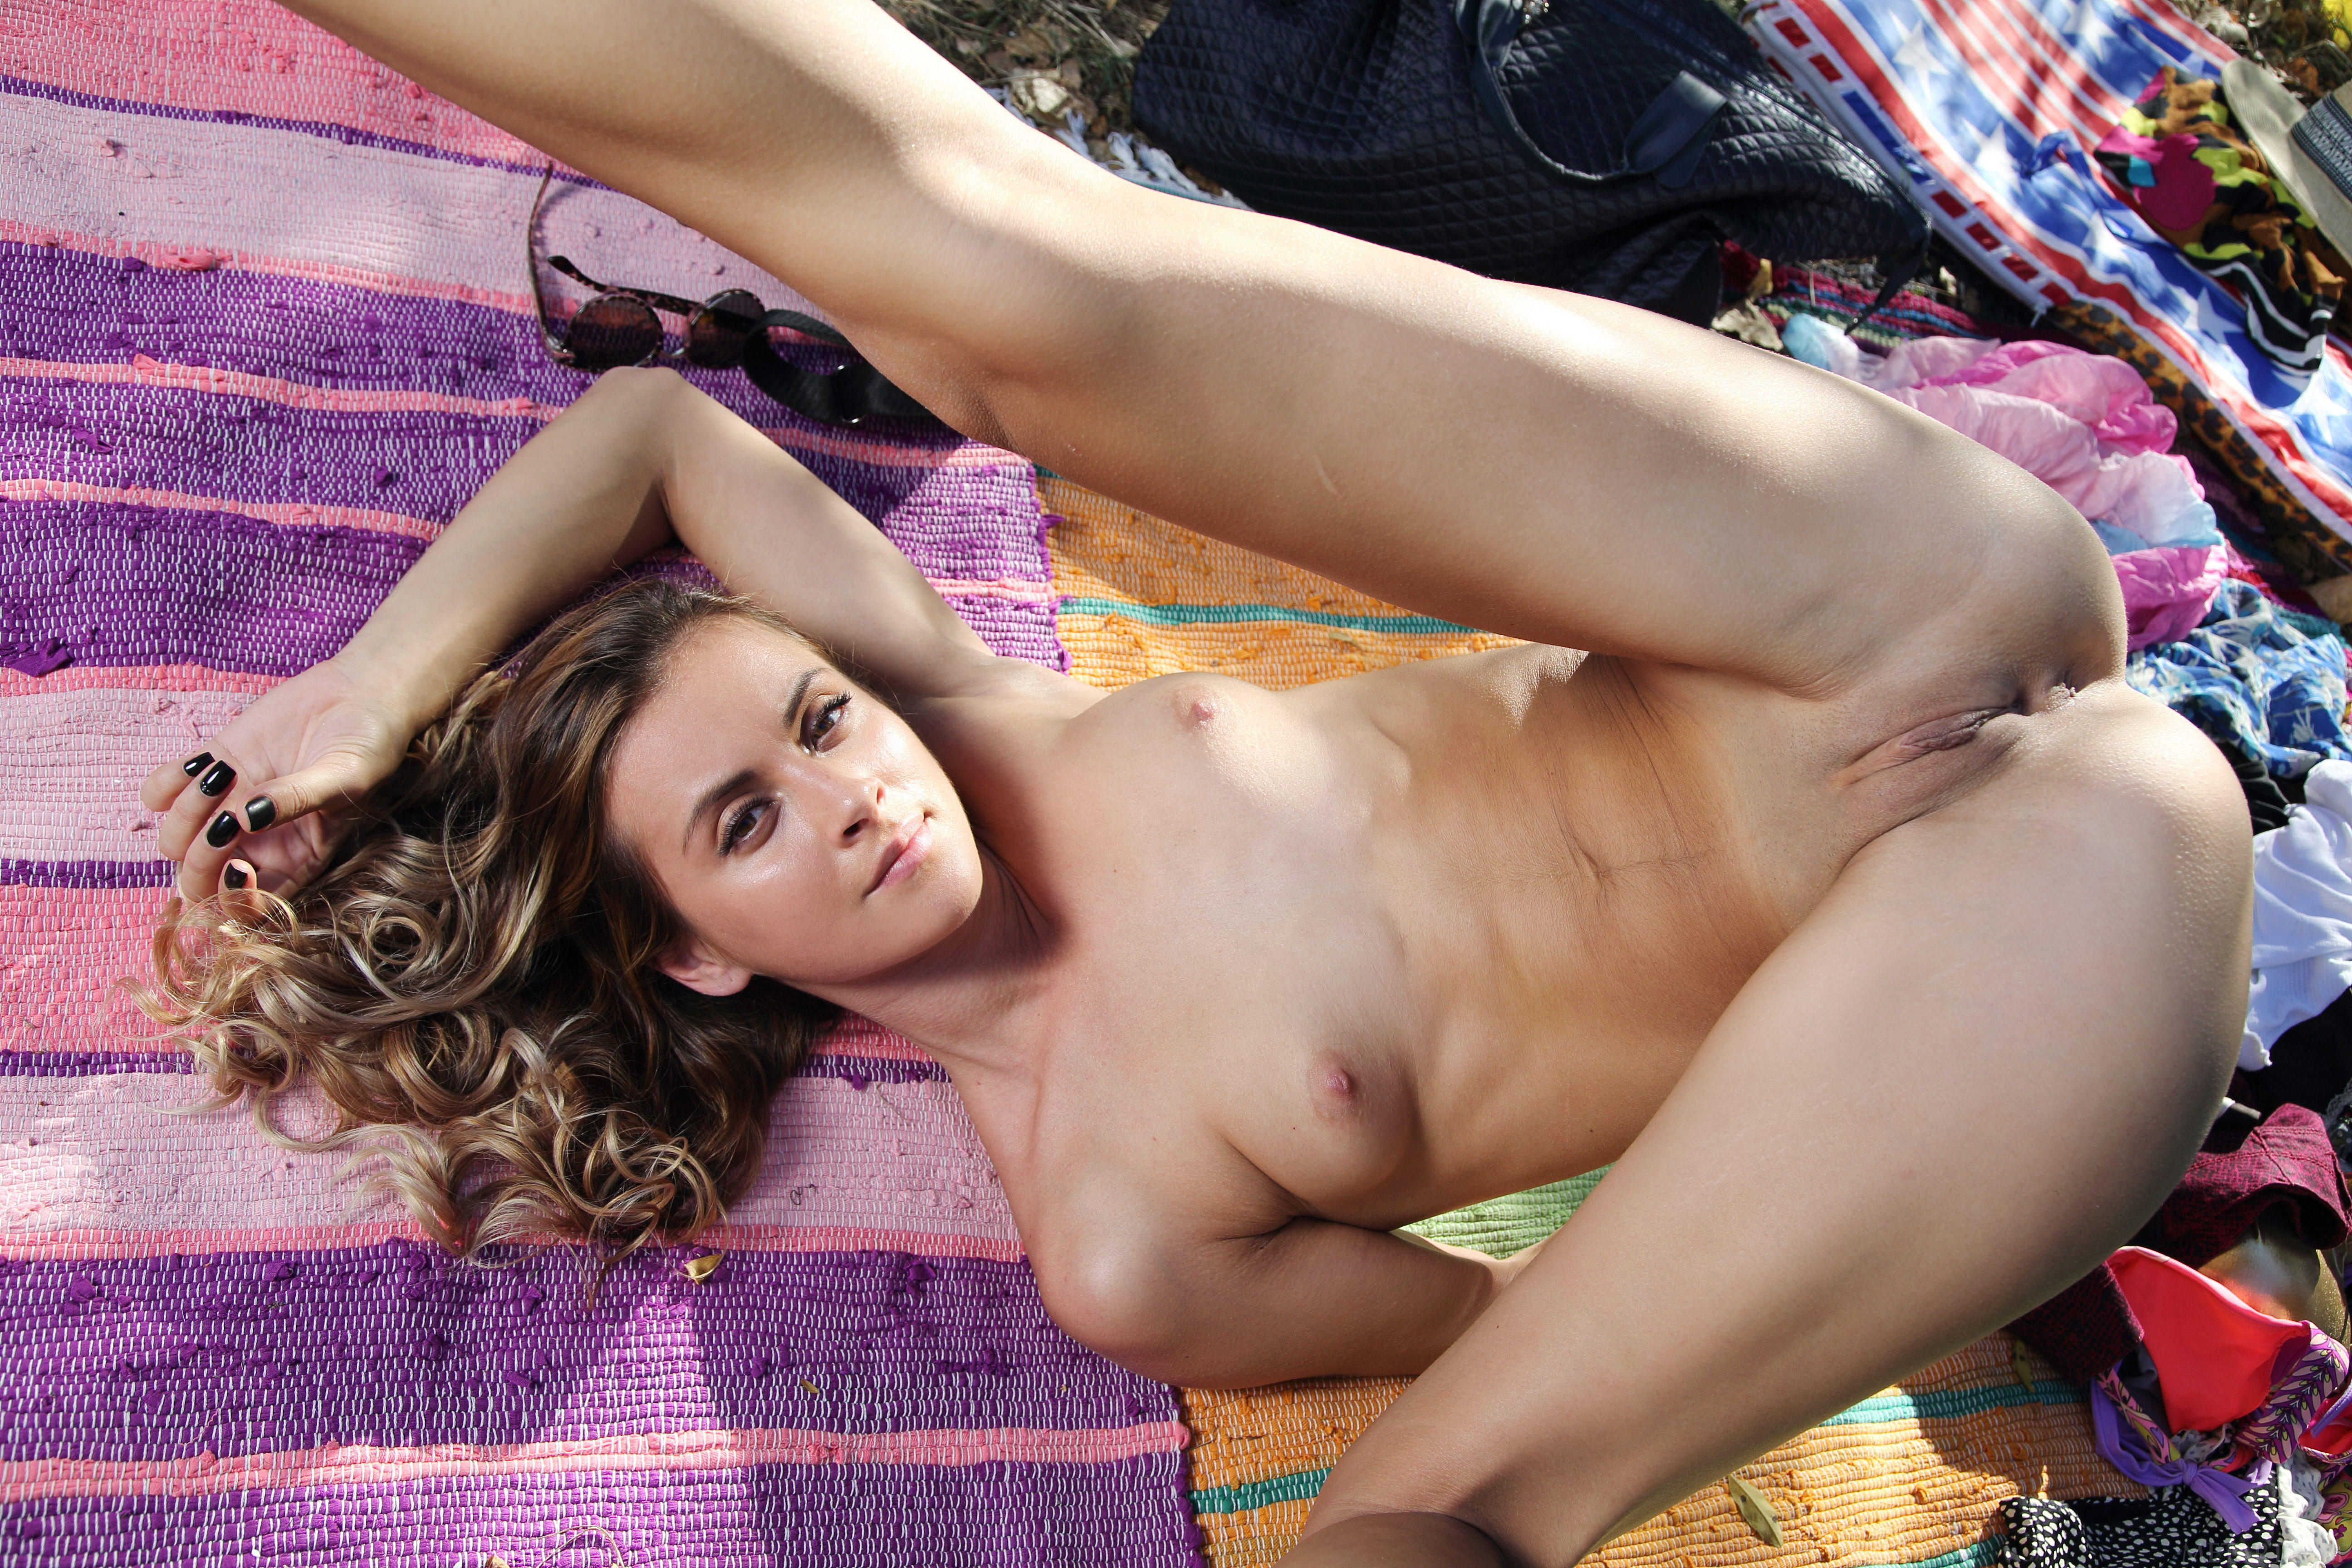 обои Juck, красотка, голая, голая девушка картинки фото